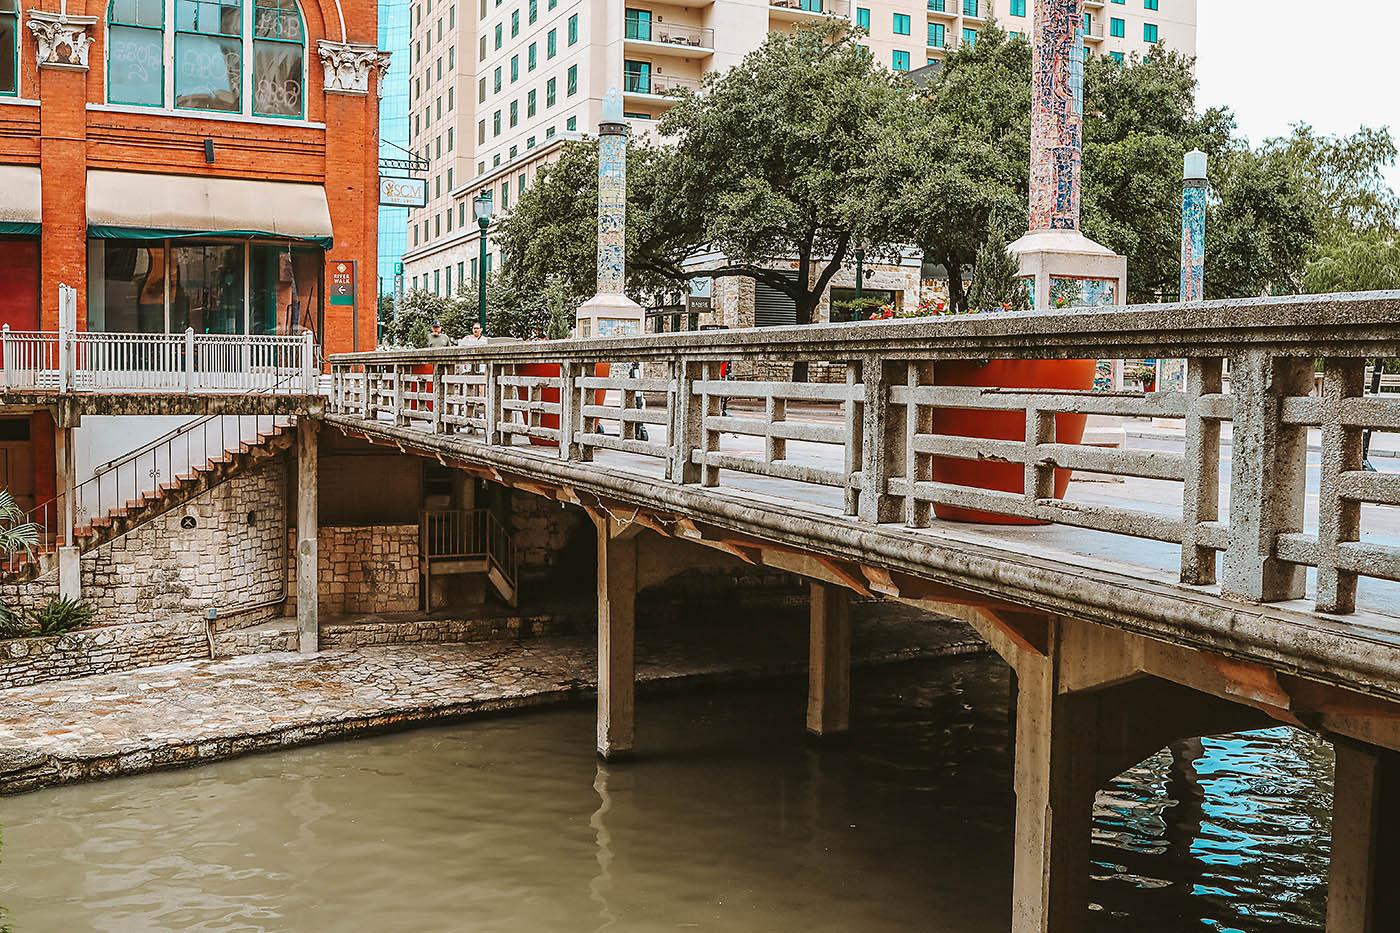 View of San Antonio Riverwalk from hotel